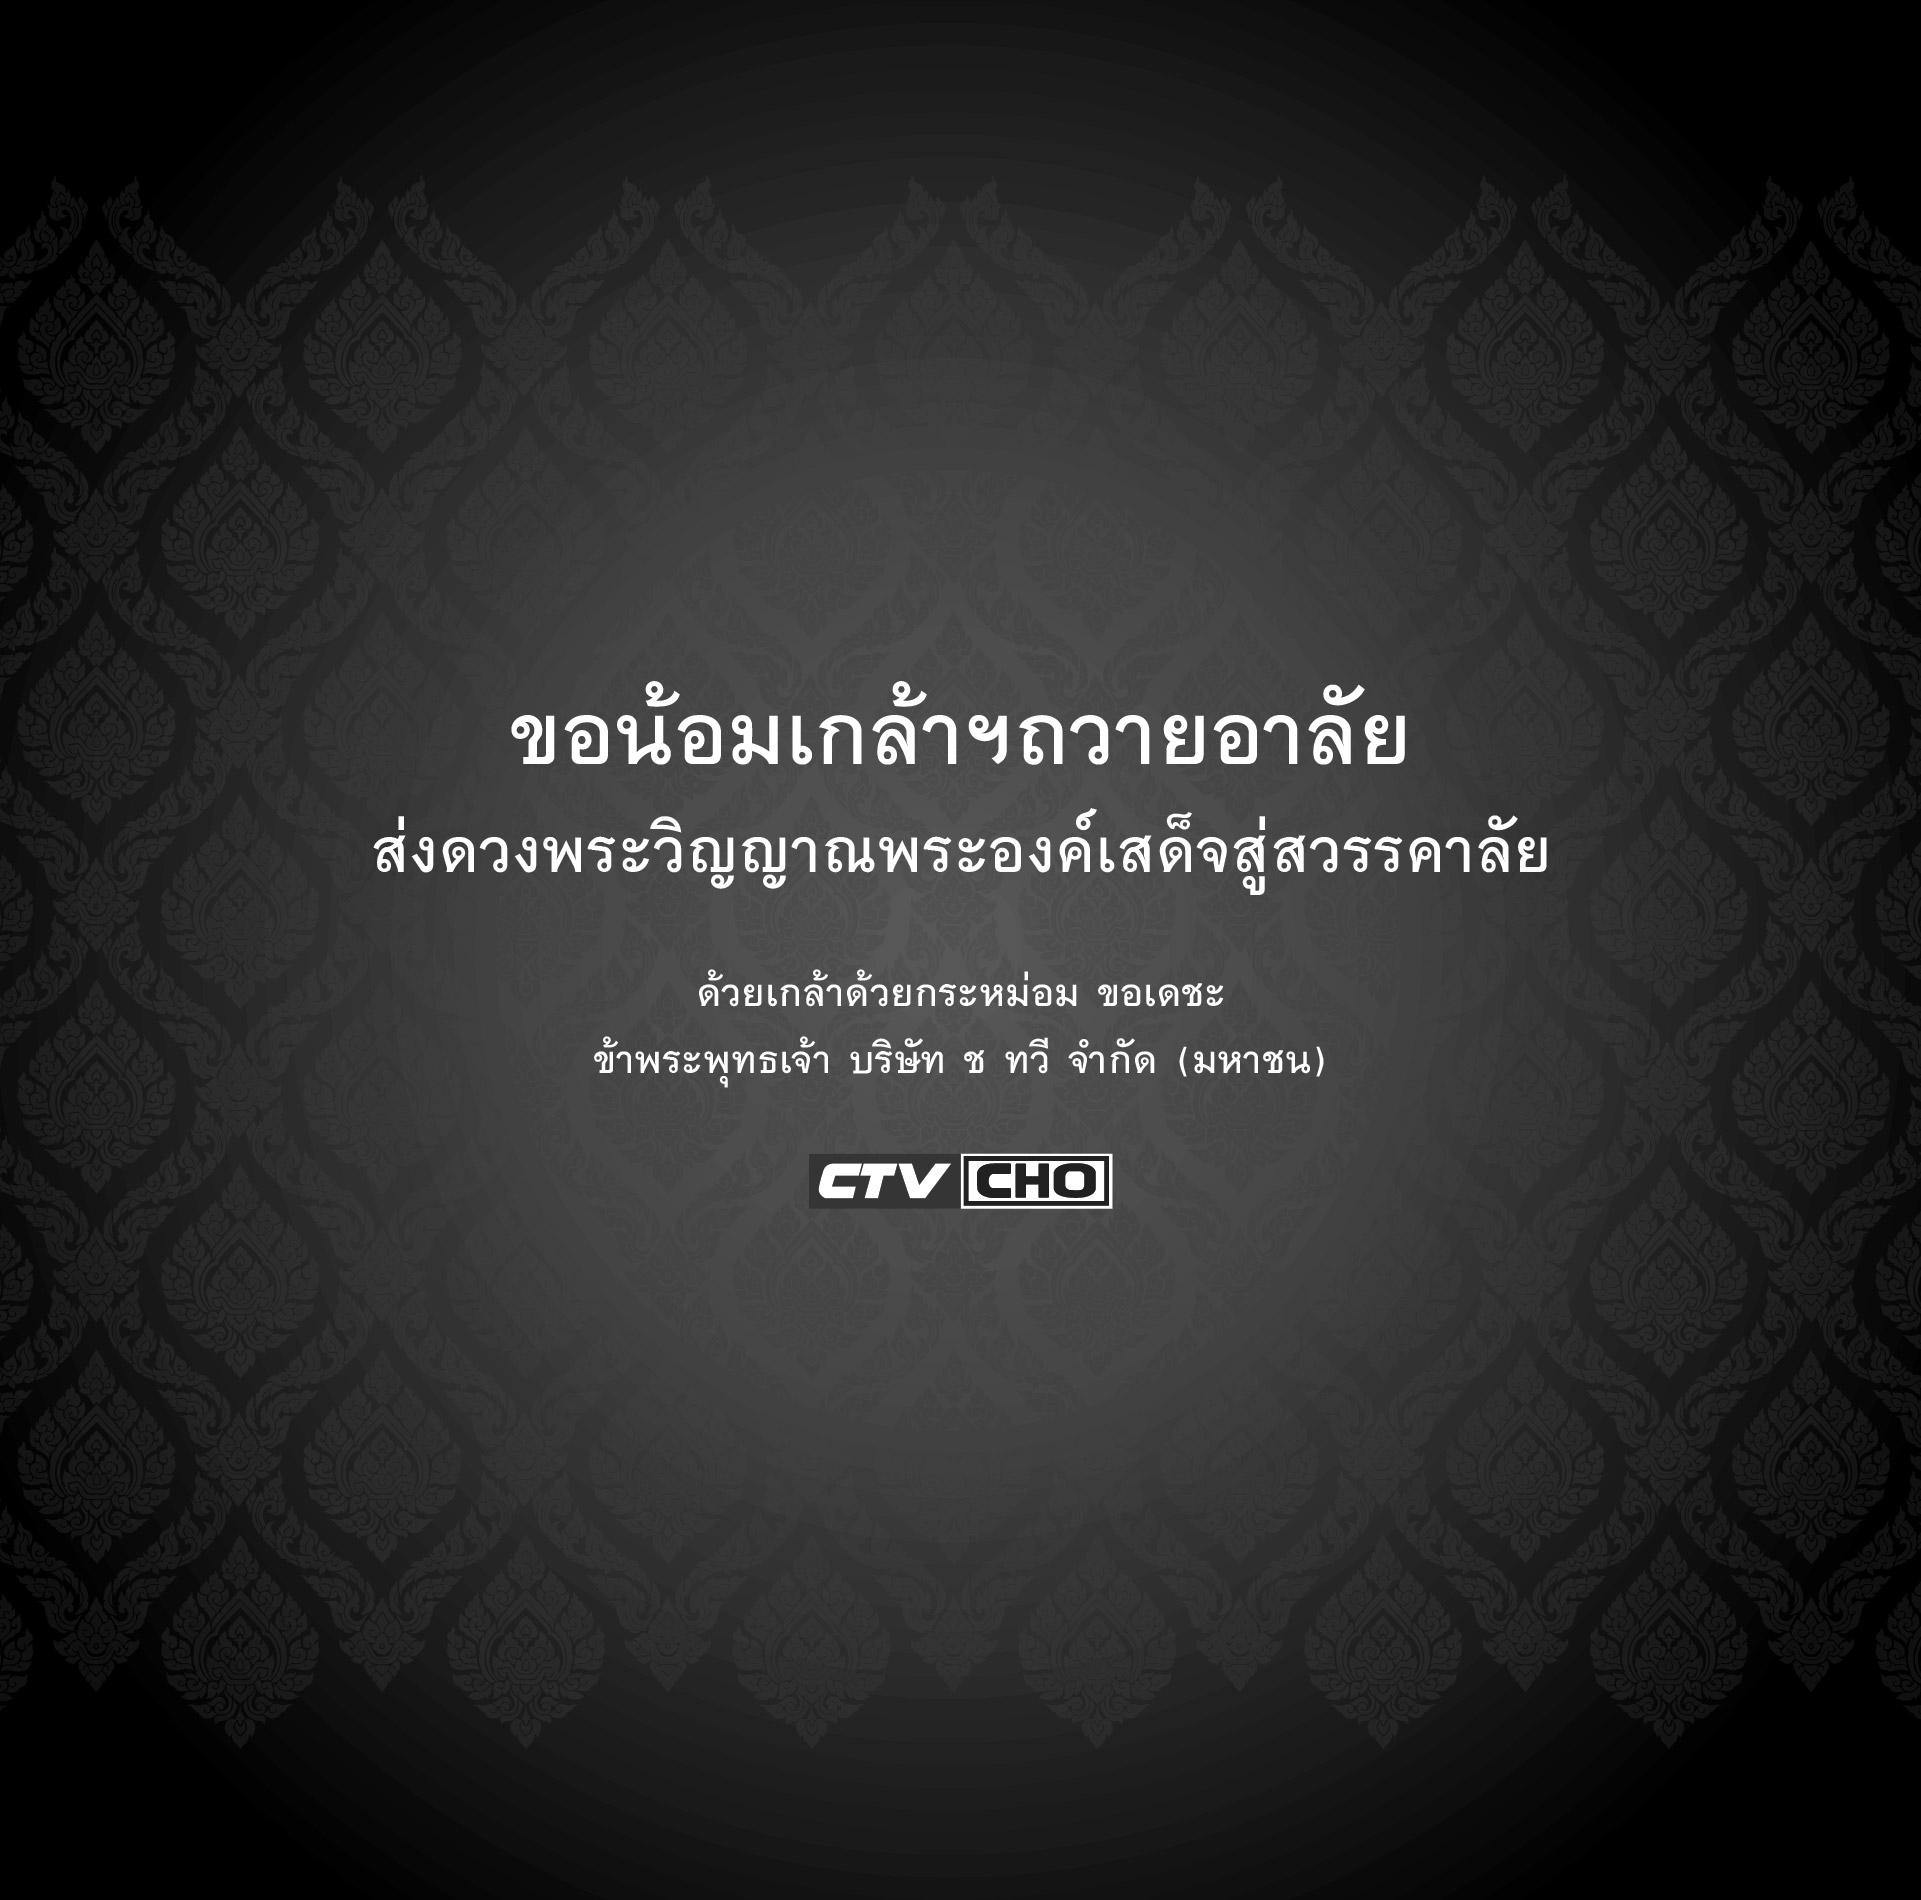 King_Farewell03-01